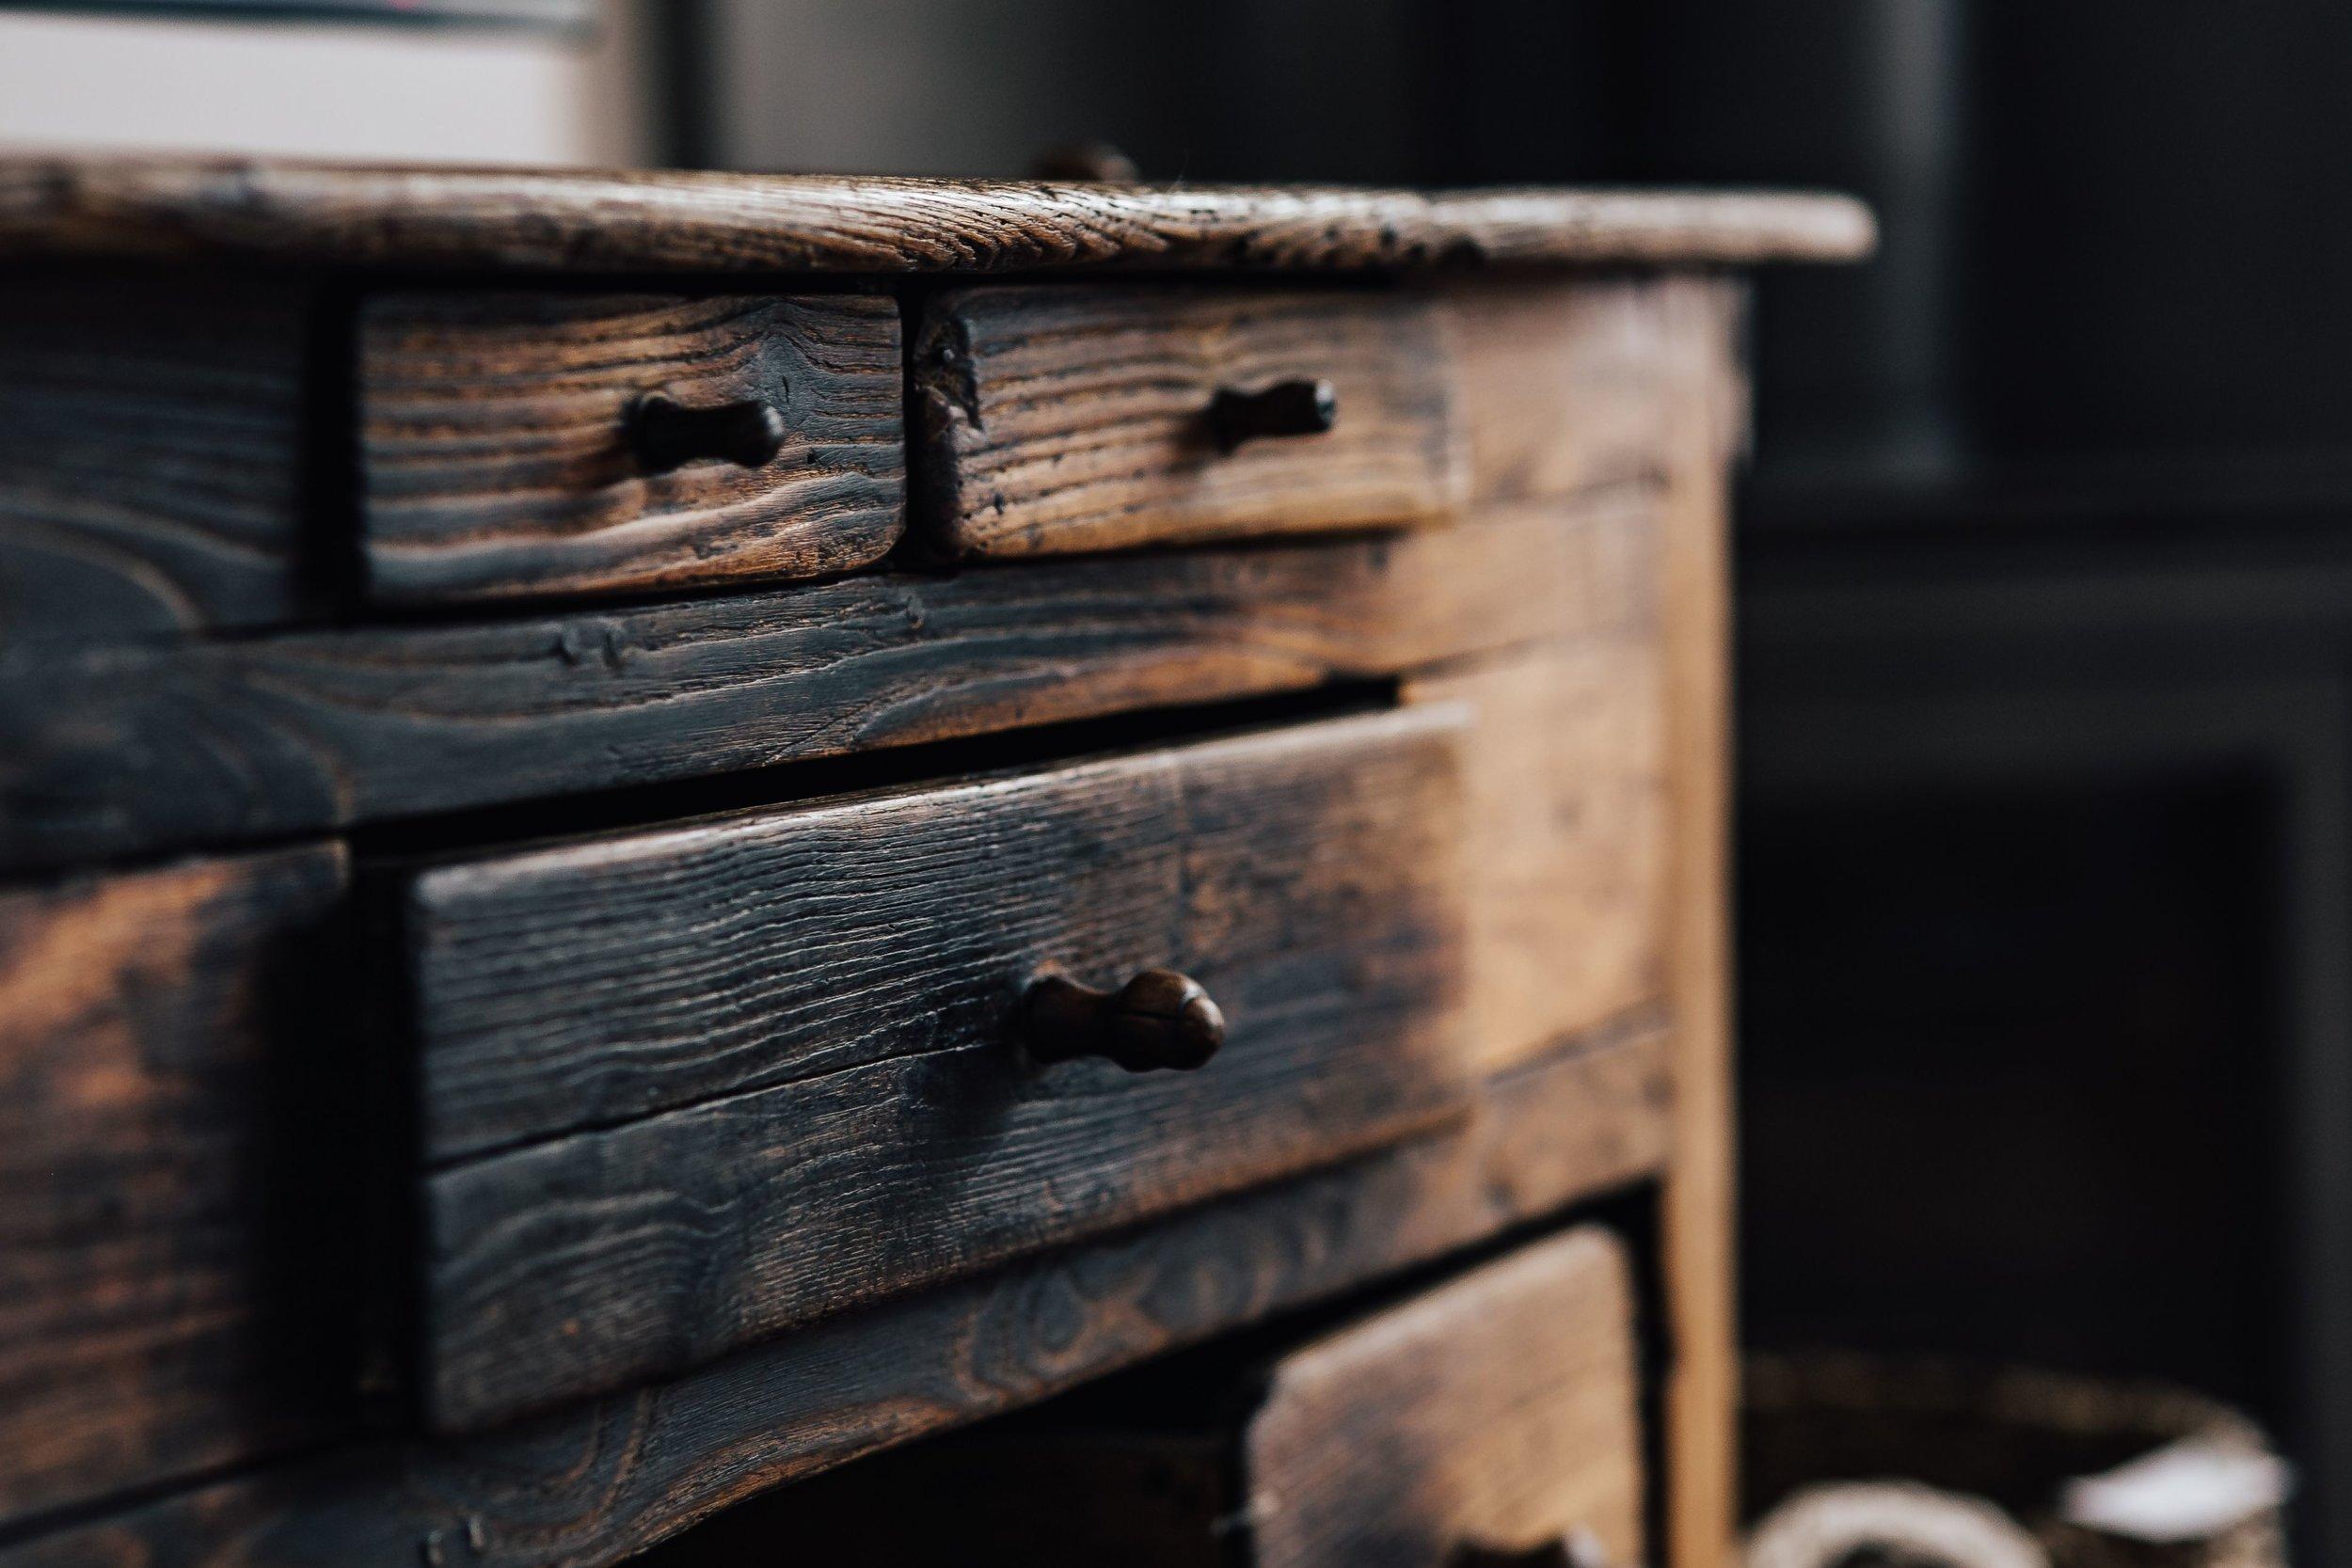 kaboompics_Vintage furniture, drawers.jpg